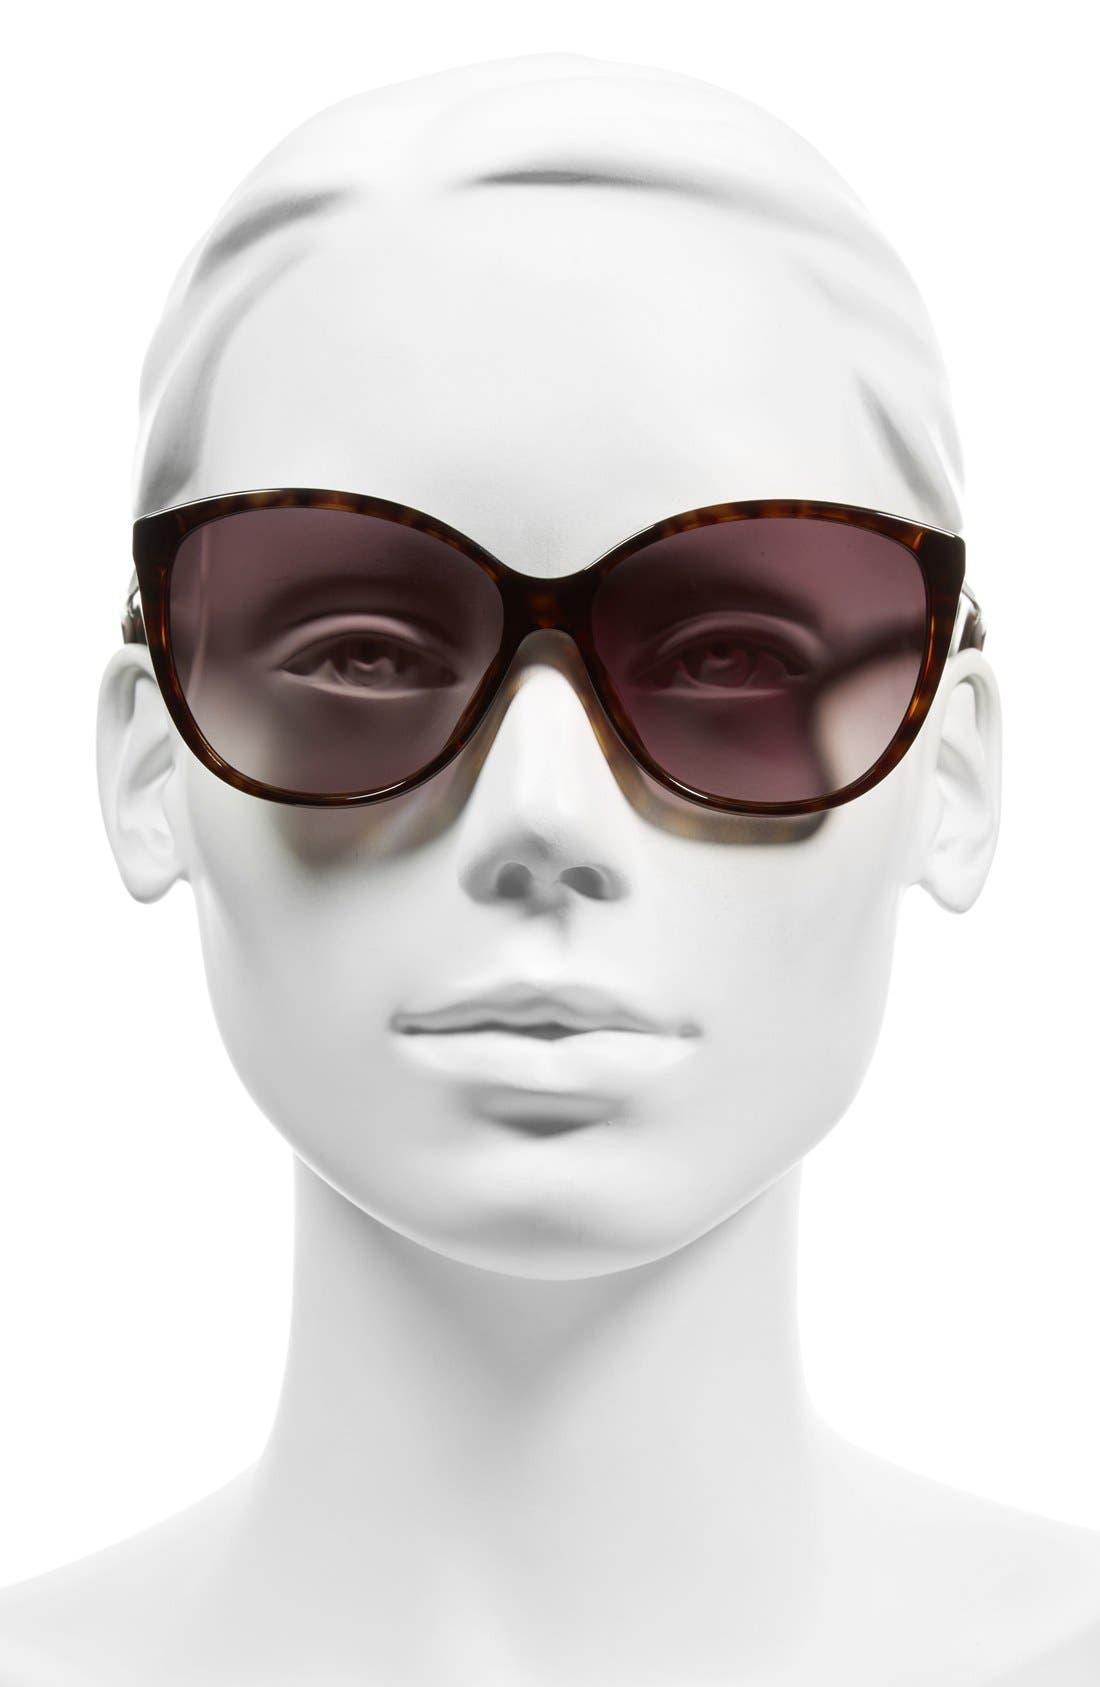 58mm Polarized Butterfly Sunglasses,                             Alternate thumbnail 2, color,                             DARK HAVANA